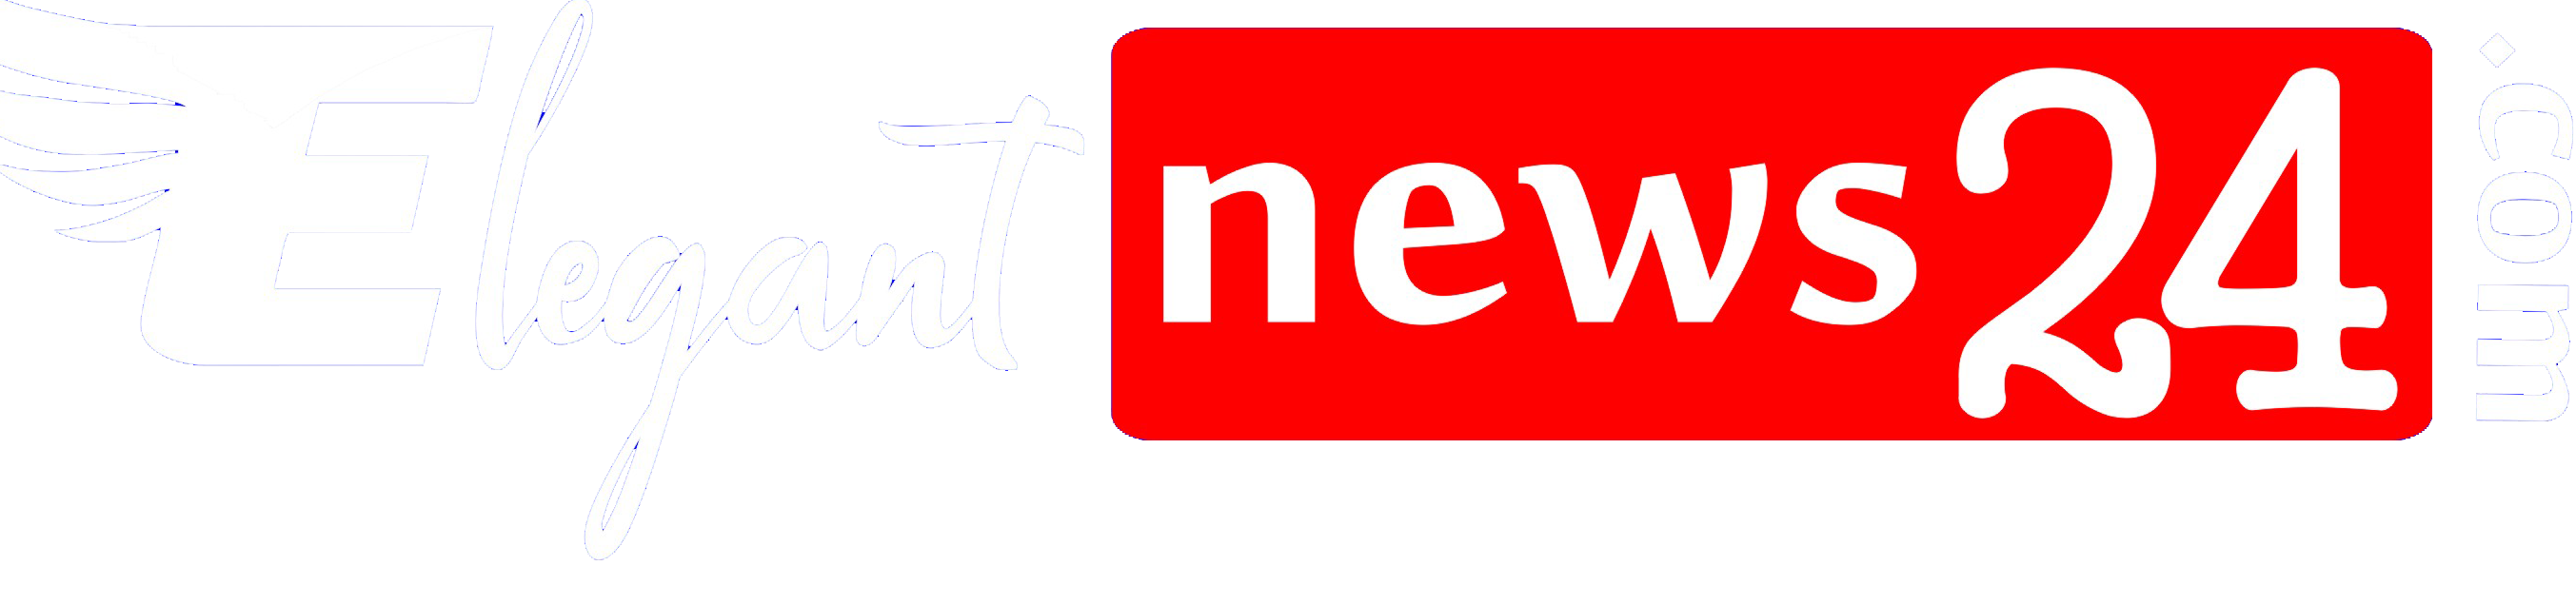 Elegant News 24